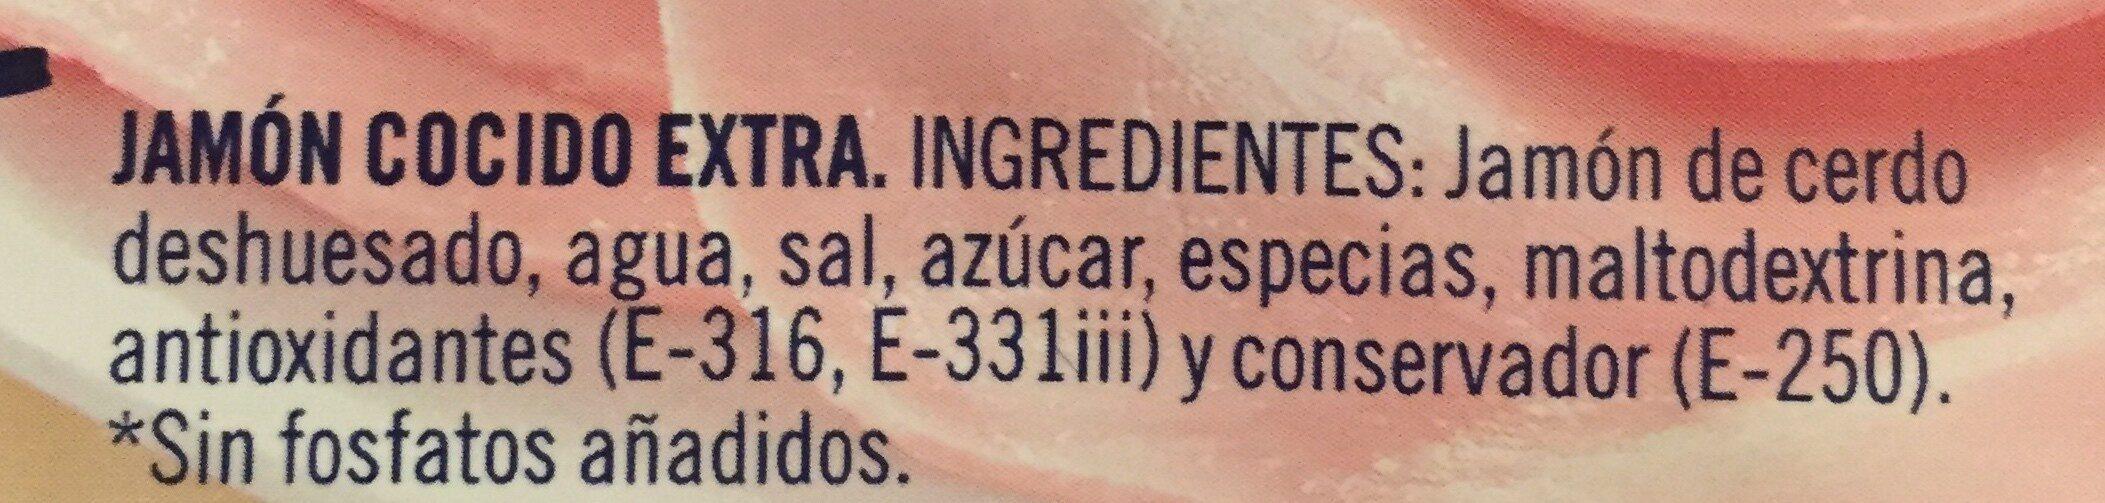 Jamón cocido extra - Ingredientes - es